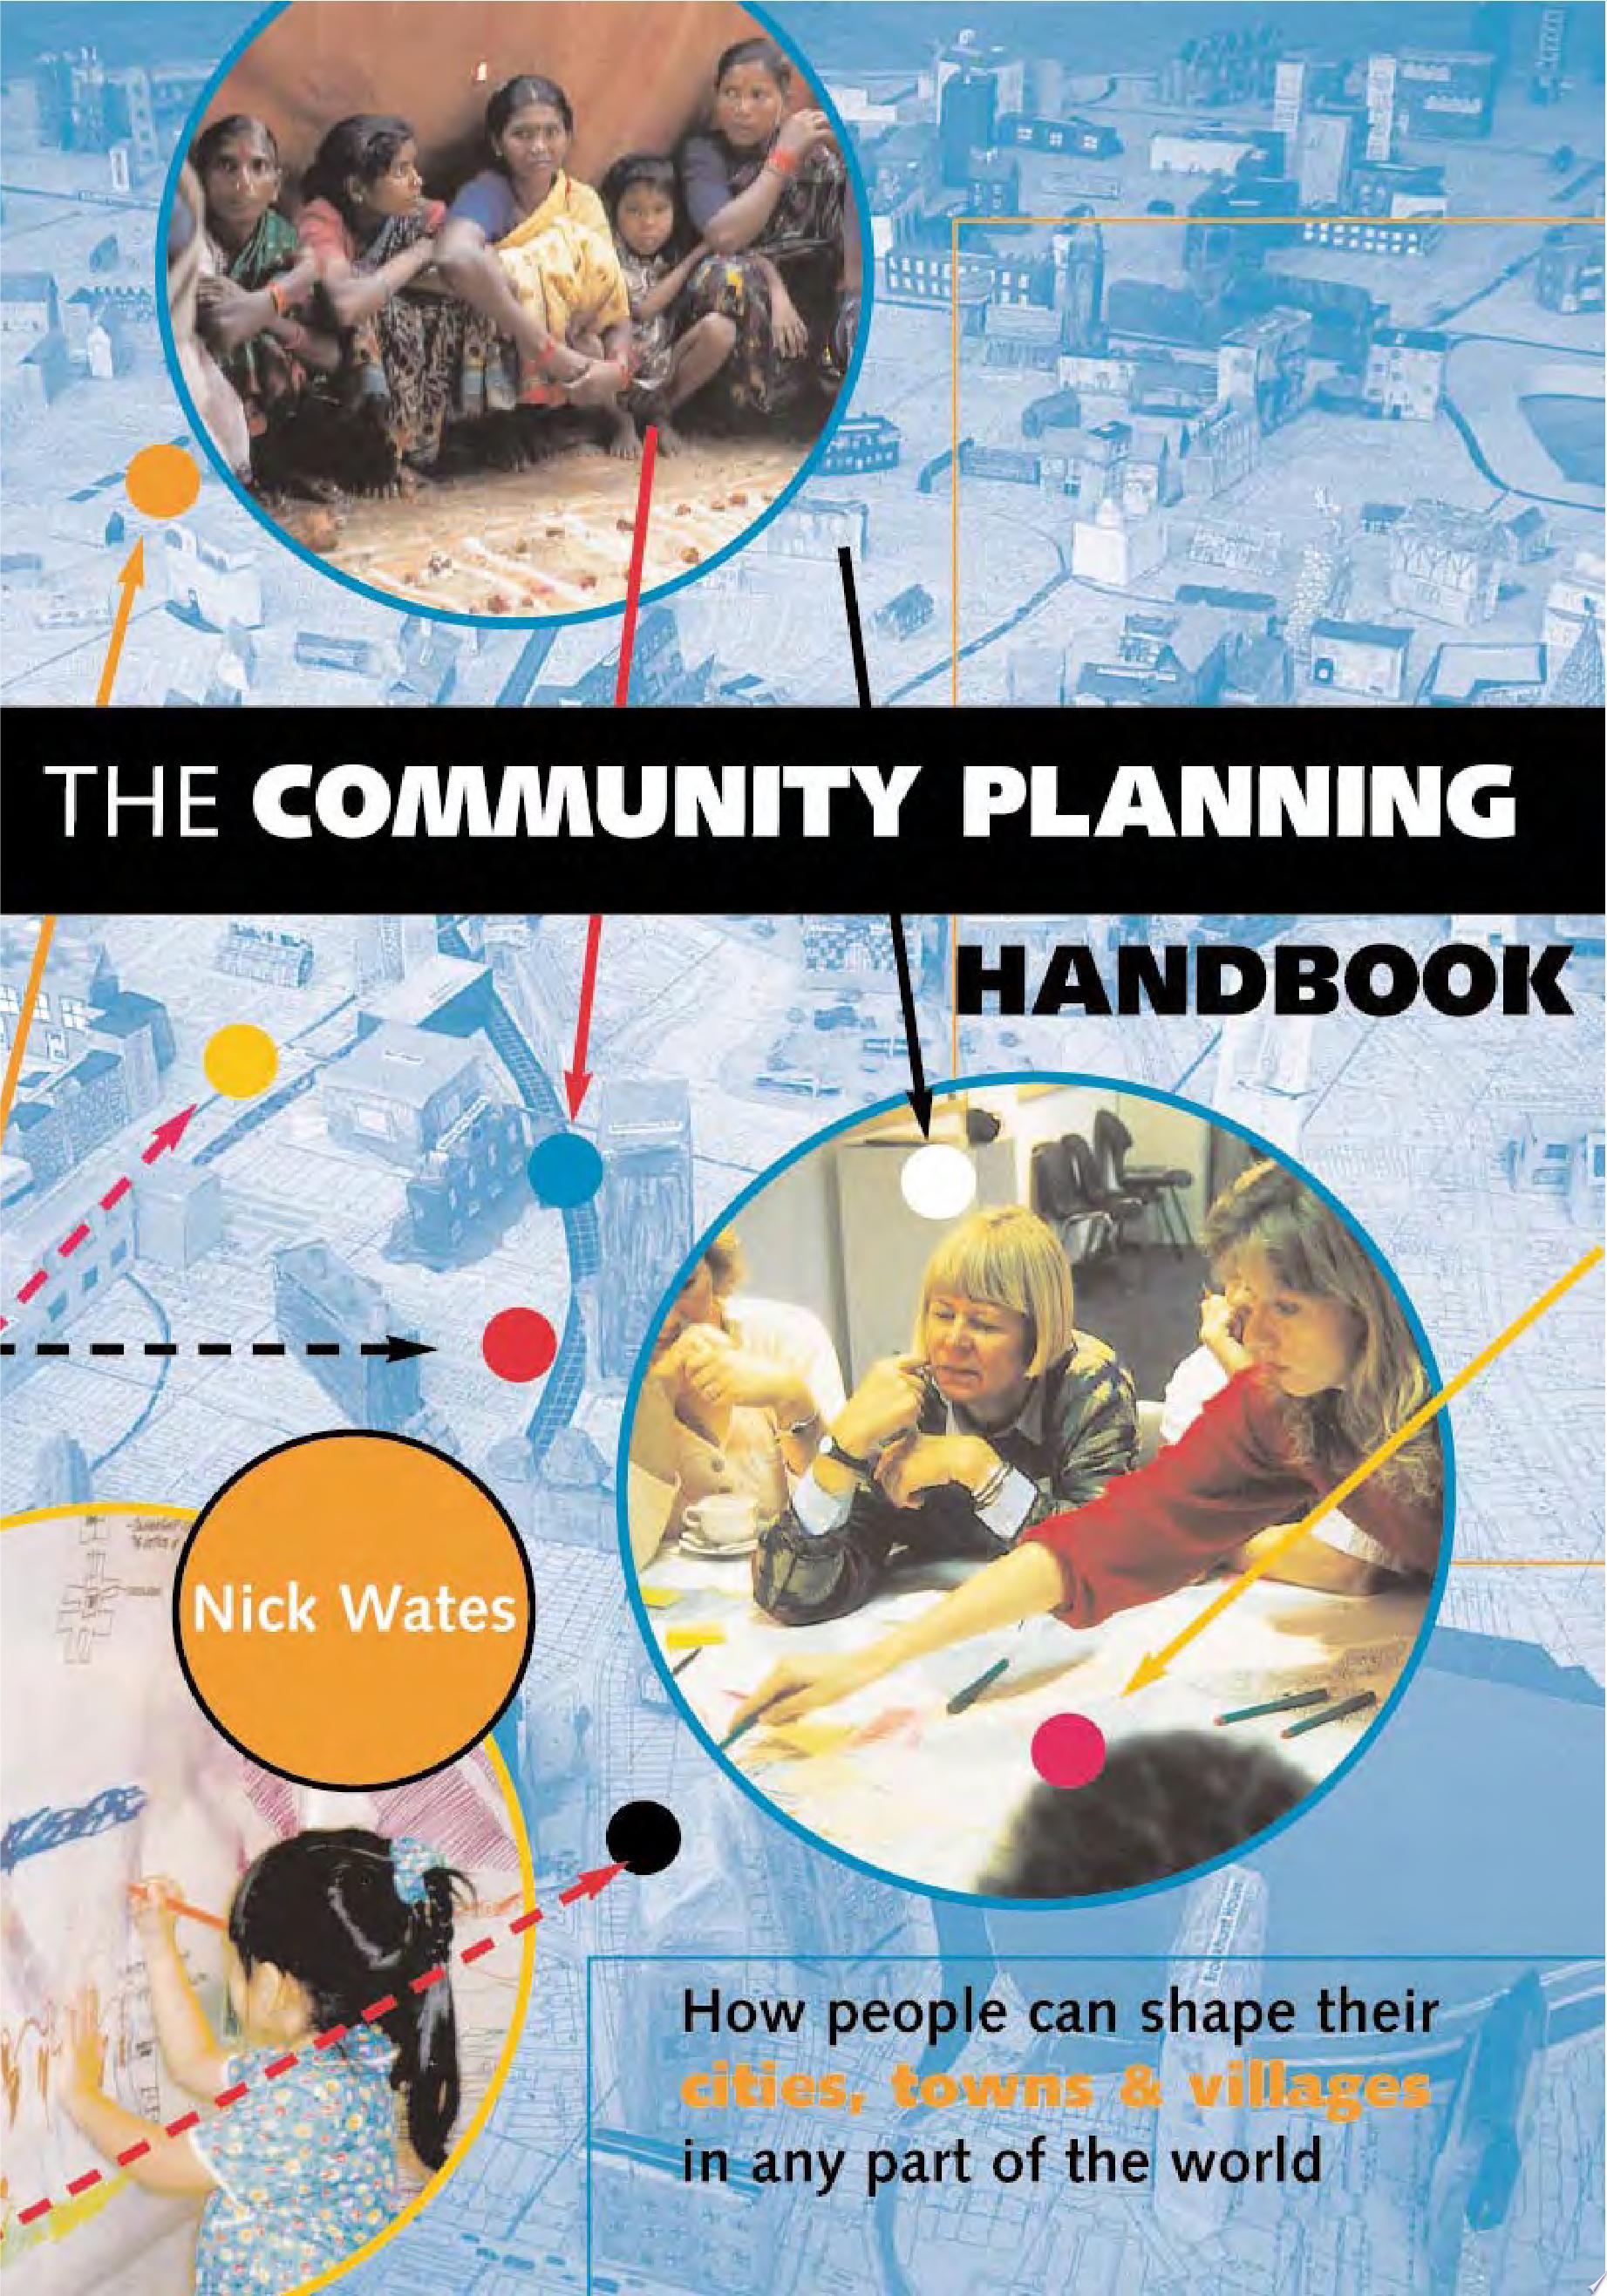 The Community Planning Handbook